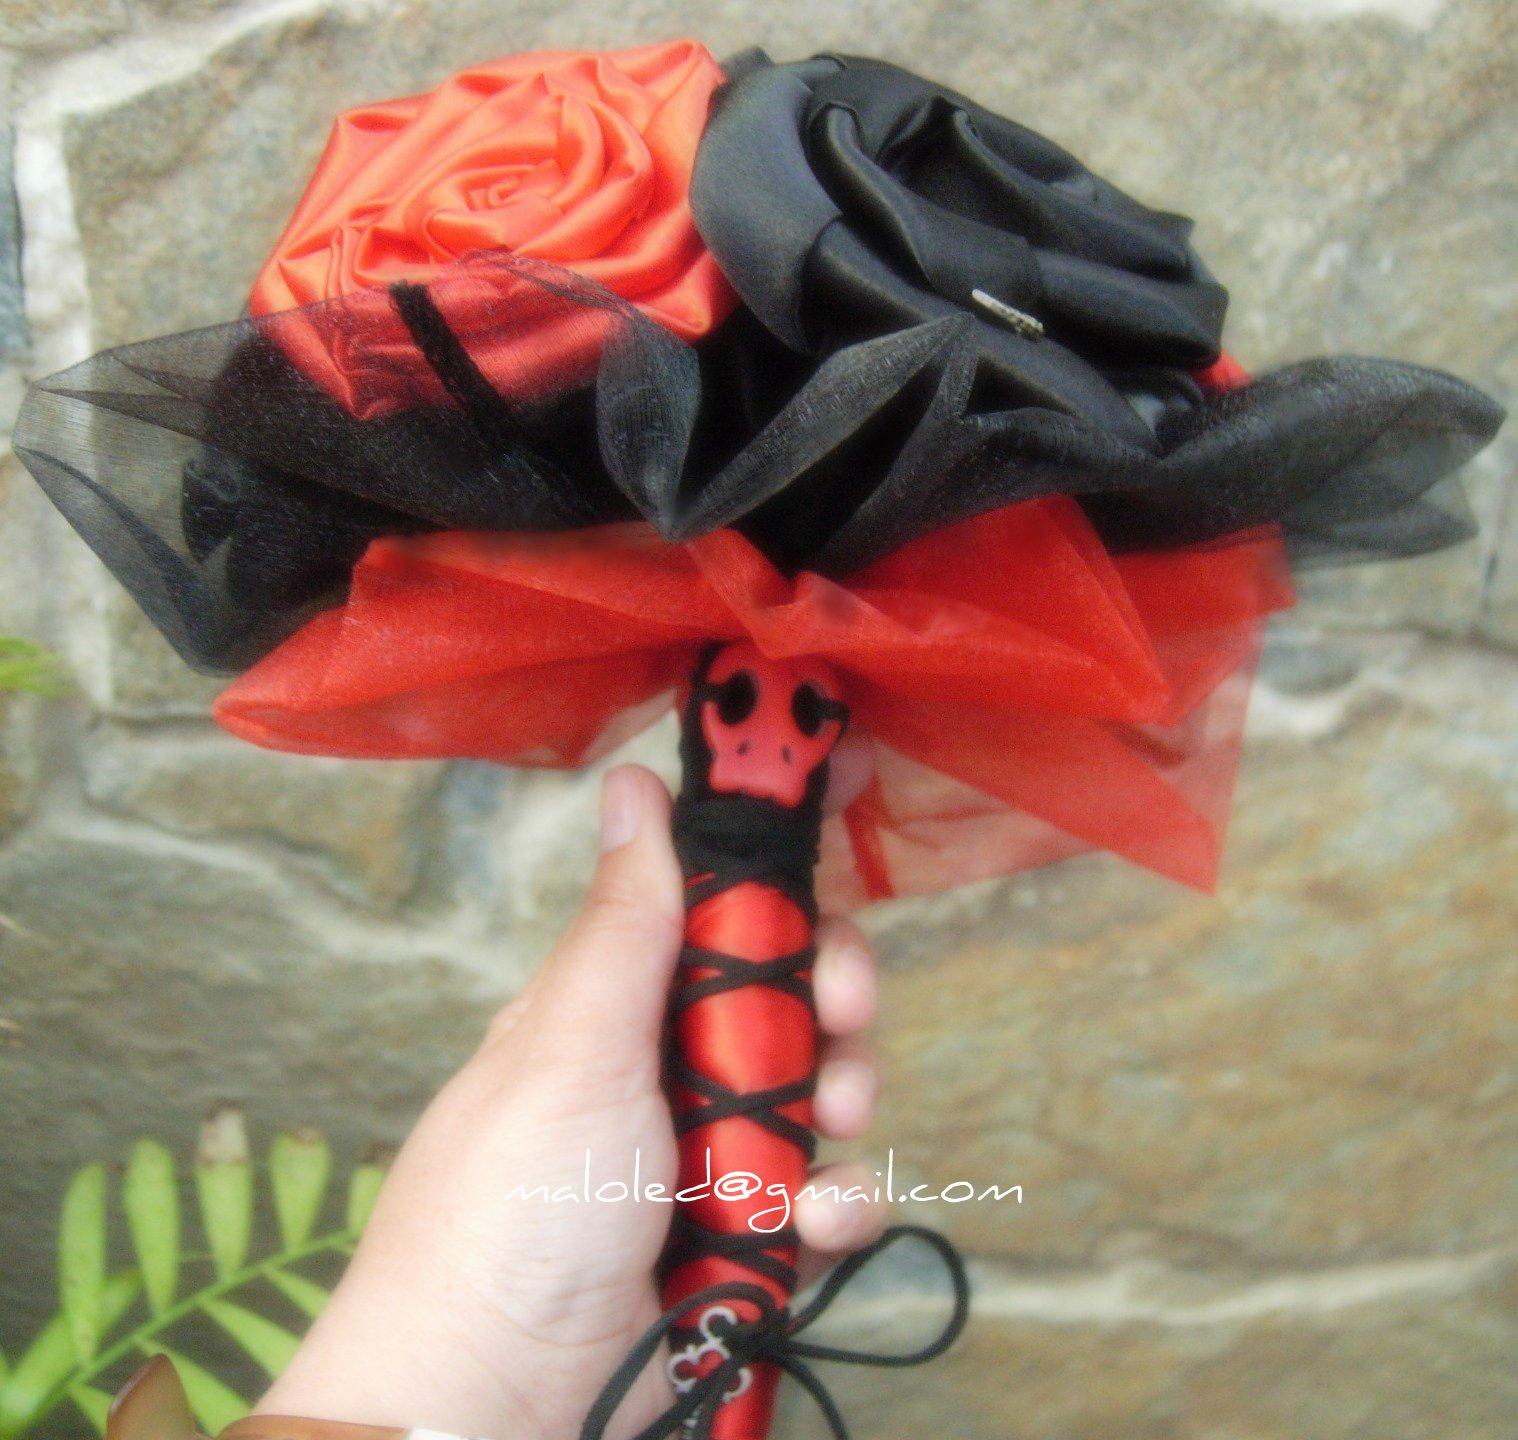 imajenes de ramos de rosas negras Mundo Imágenes - Ramos De Rosas Negras Imagenes